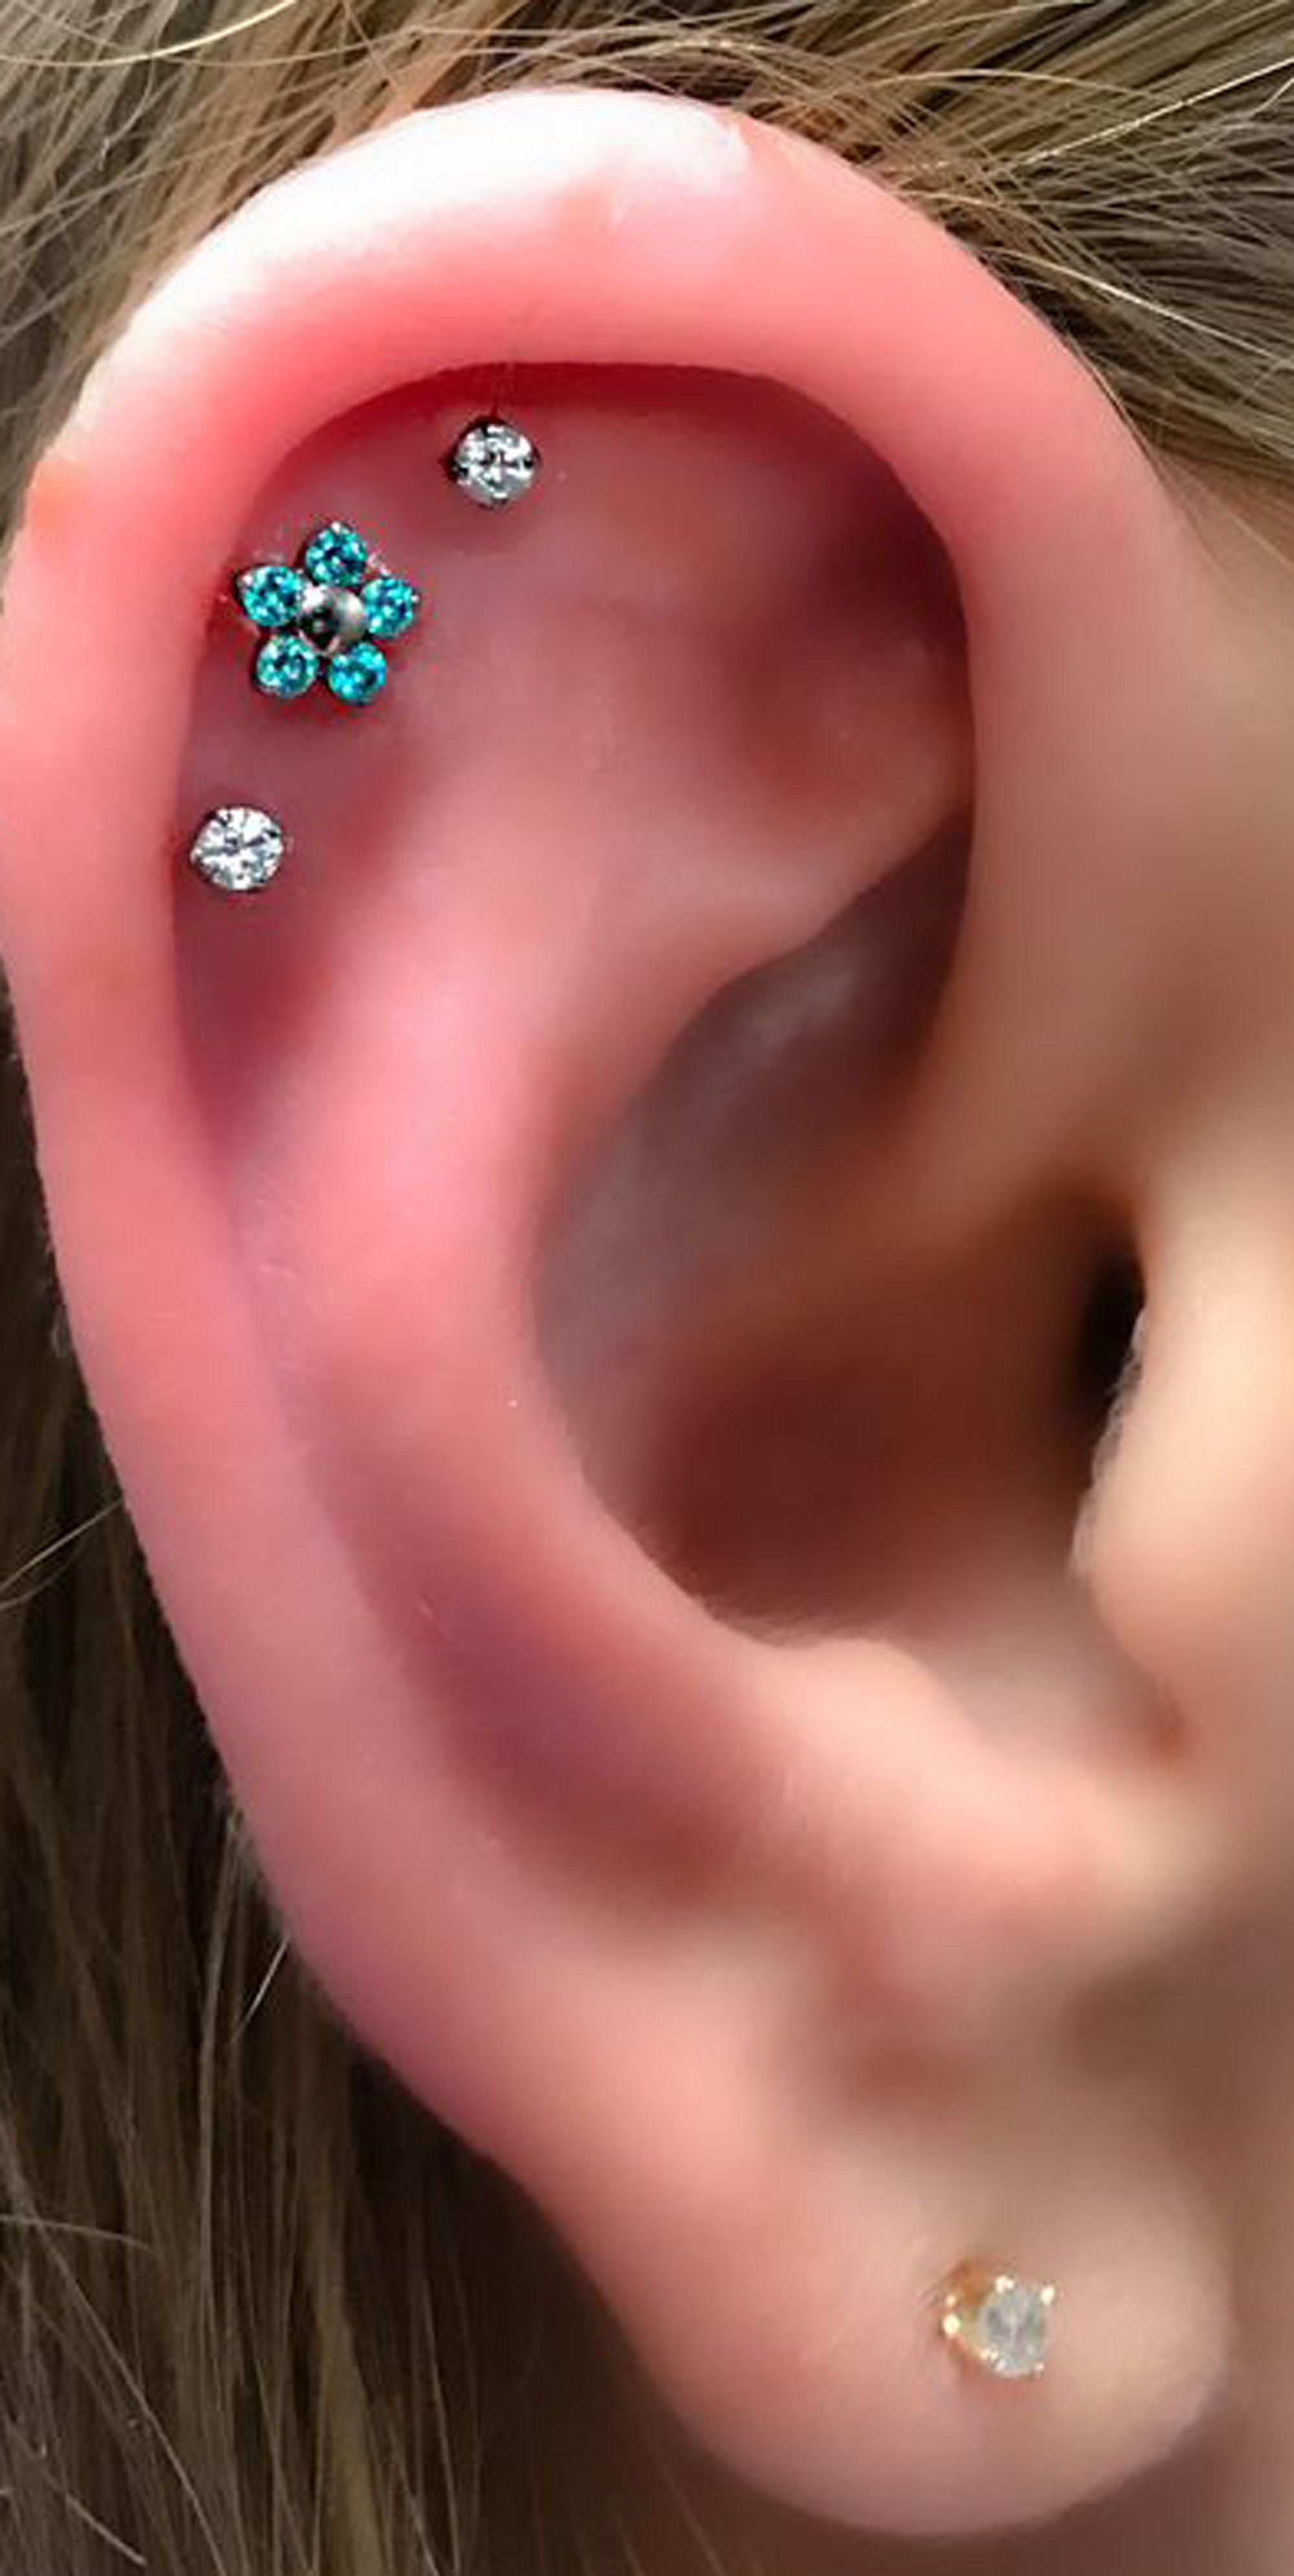 Cute piercing ideas ears  Alva Swarovski Crystal G Silver Barbell  Want  Pinterest  Helix